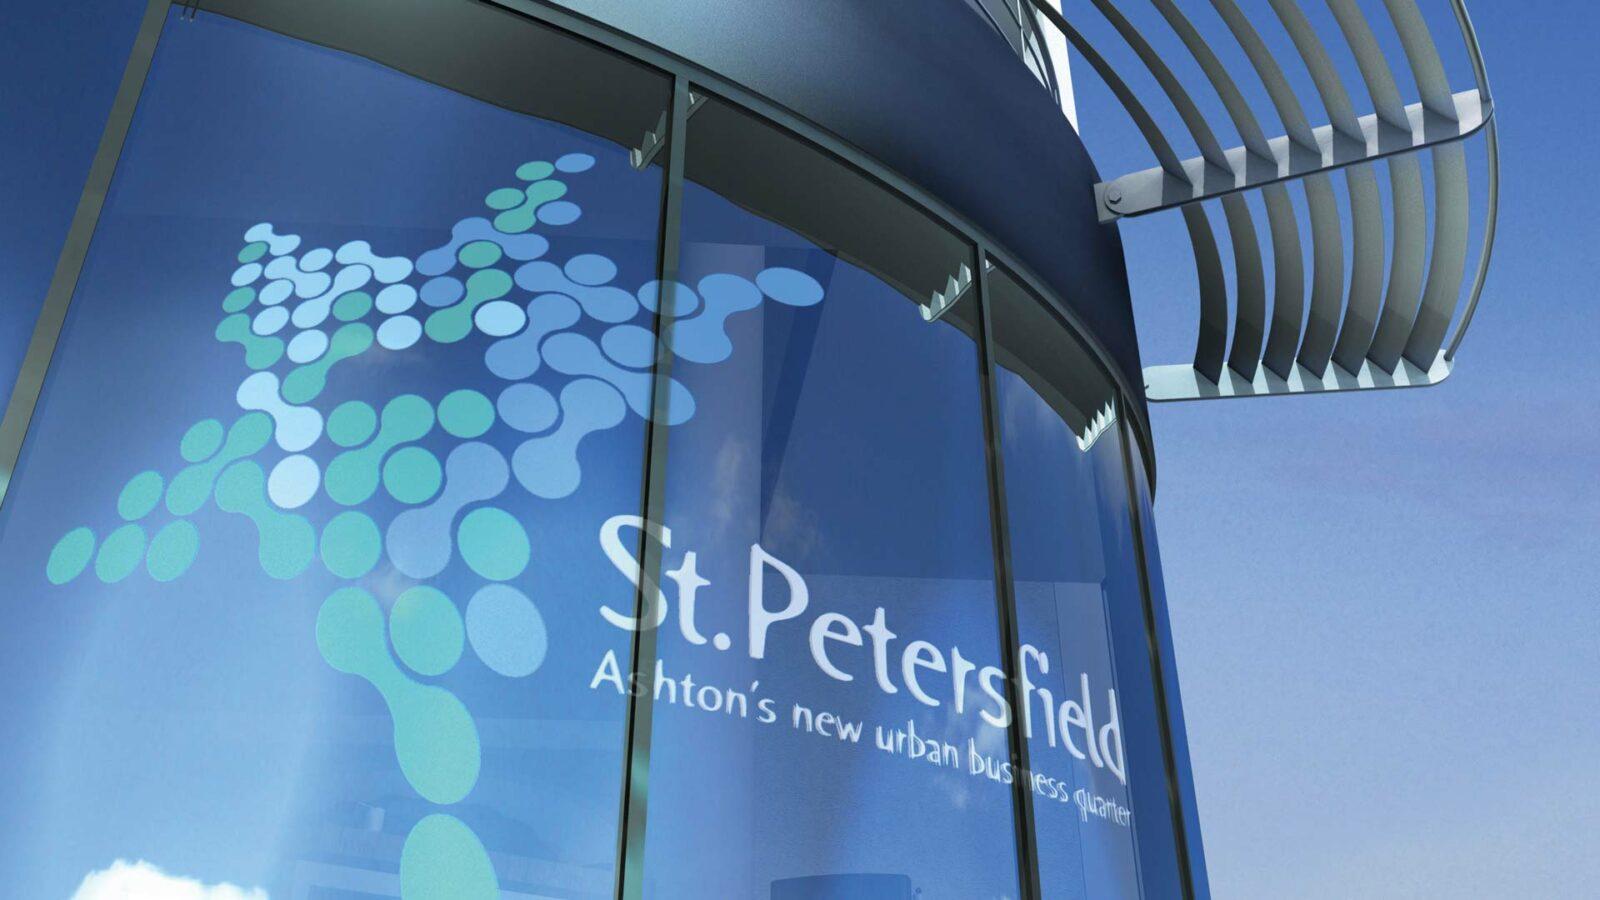 St Petersfield